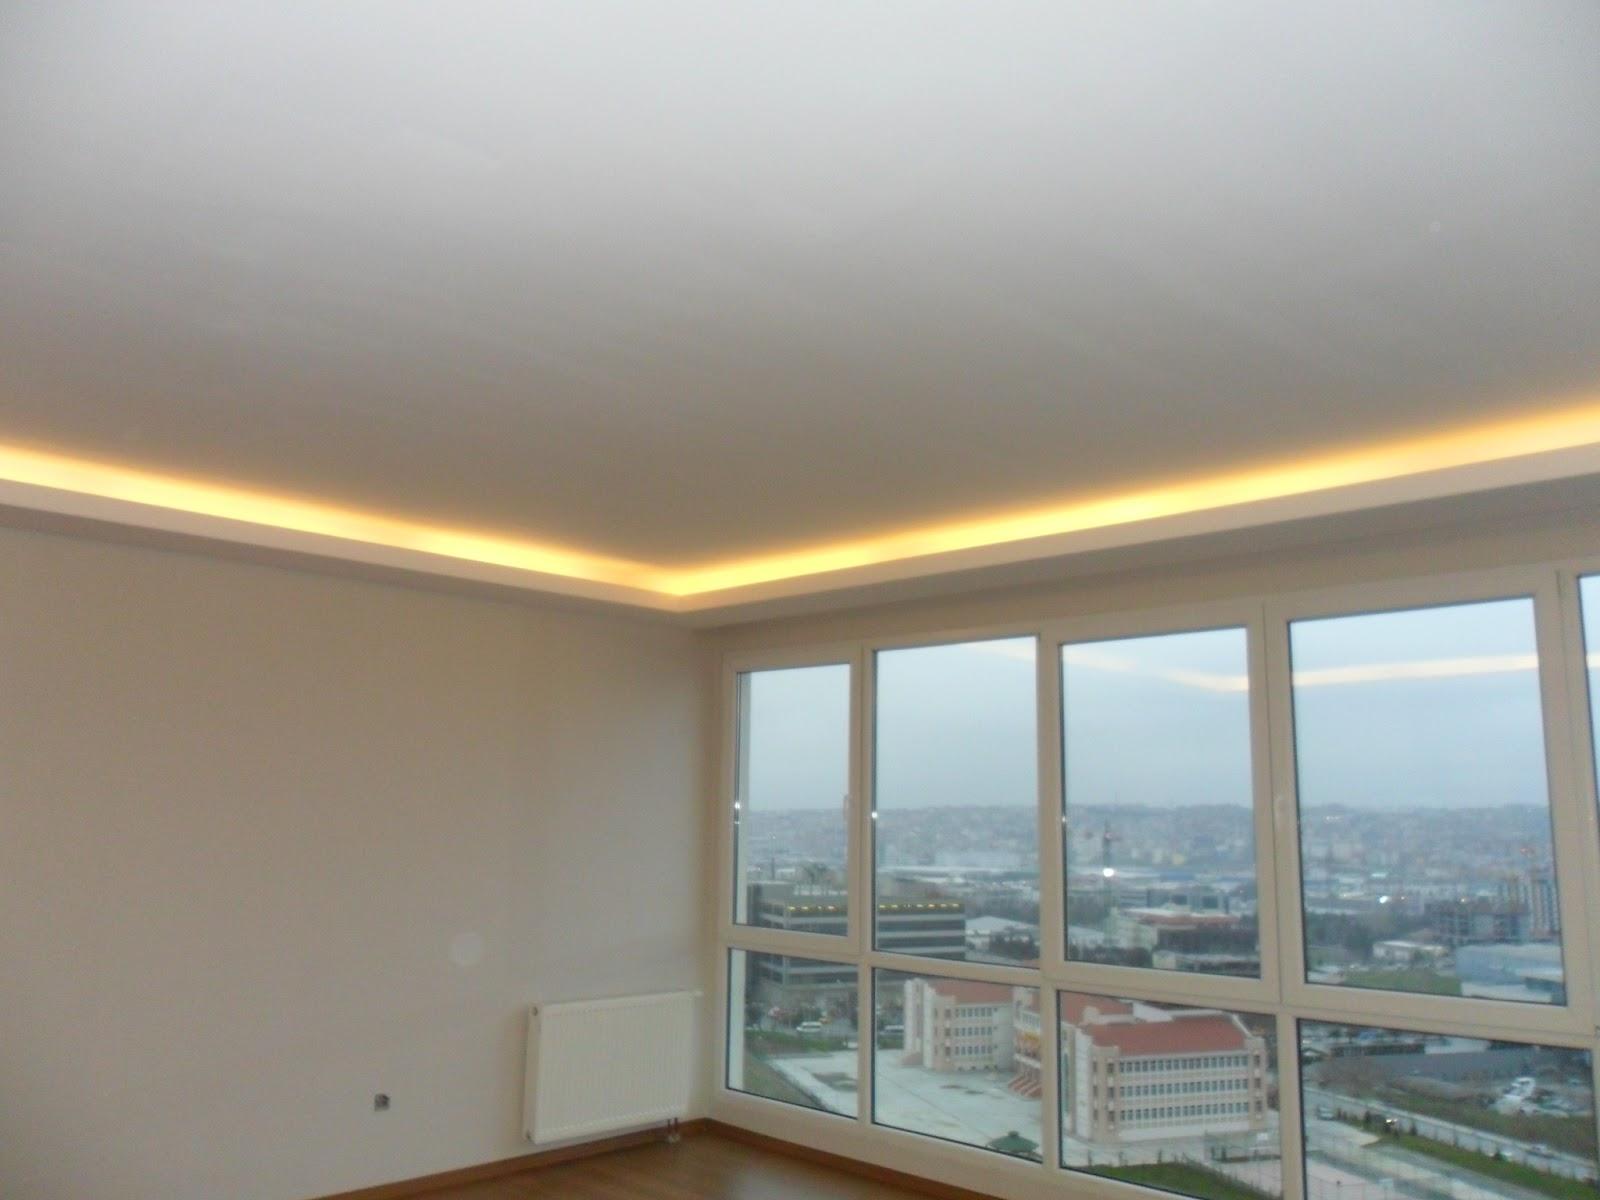 scafe rigips dormitor living poze imagini fotografii. Black Bedroom Furniture Sets. Home Design Ideas